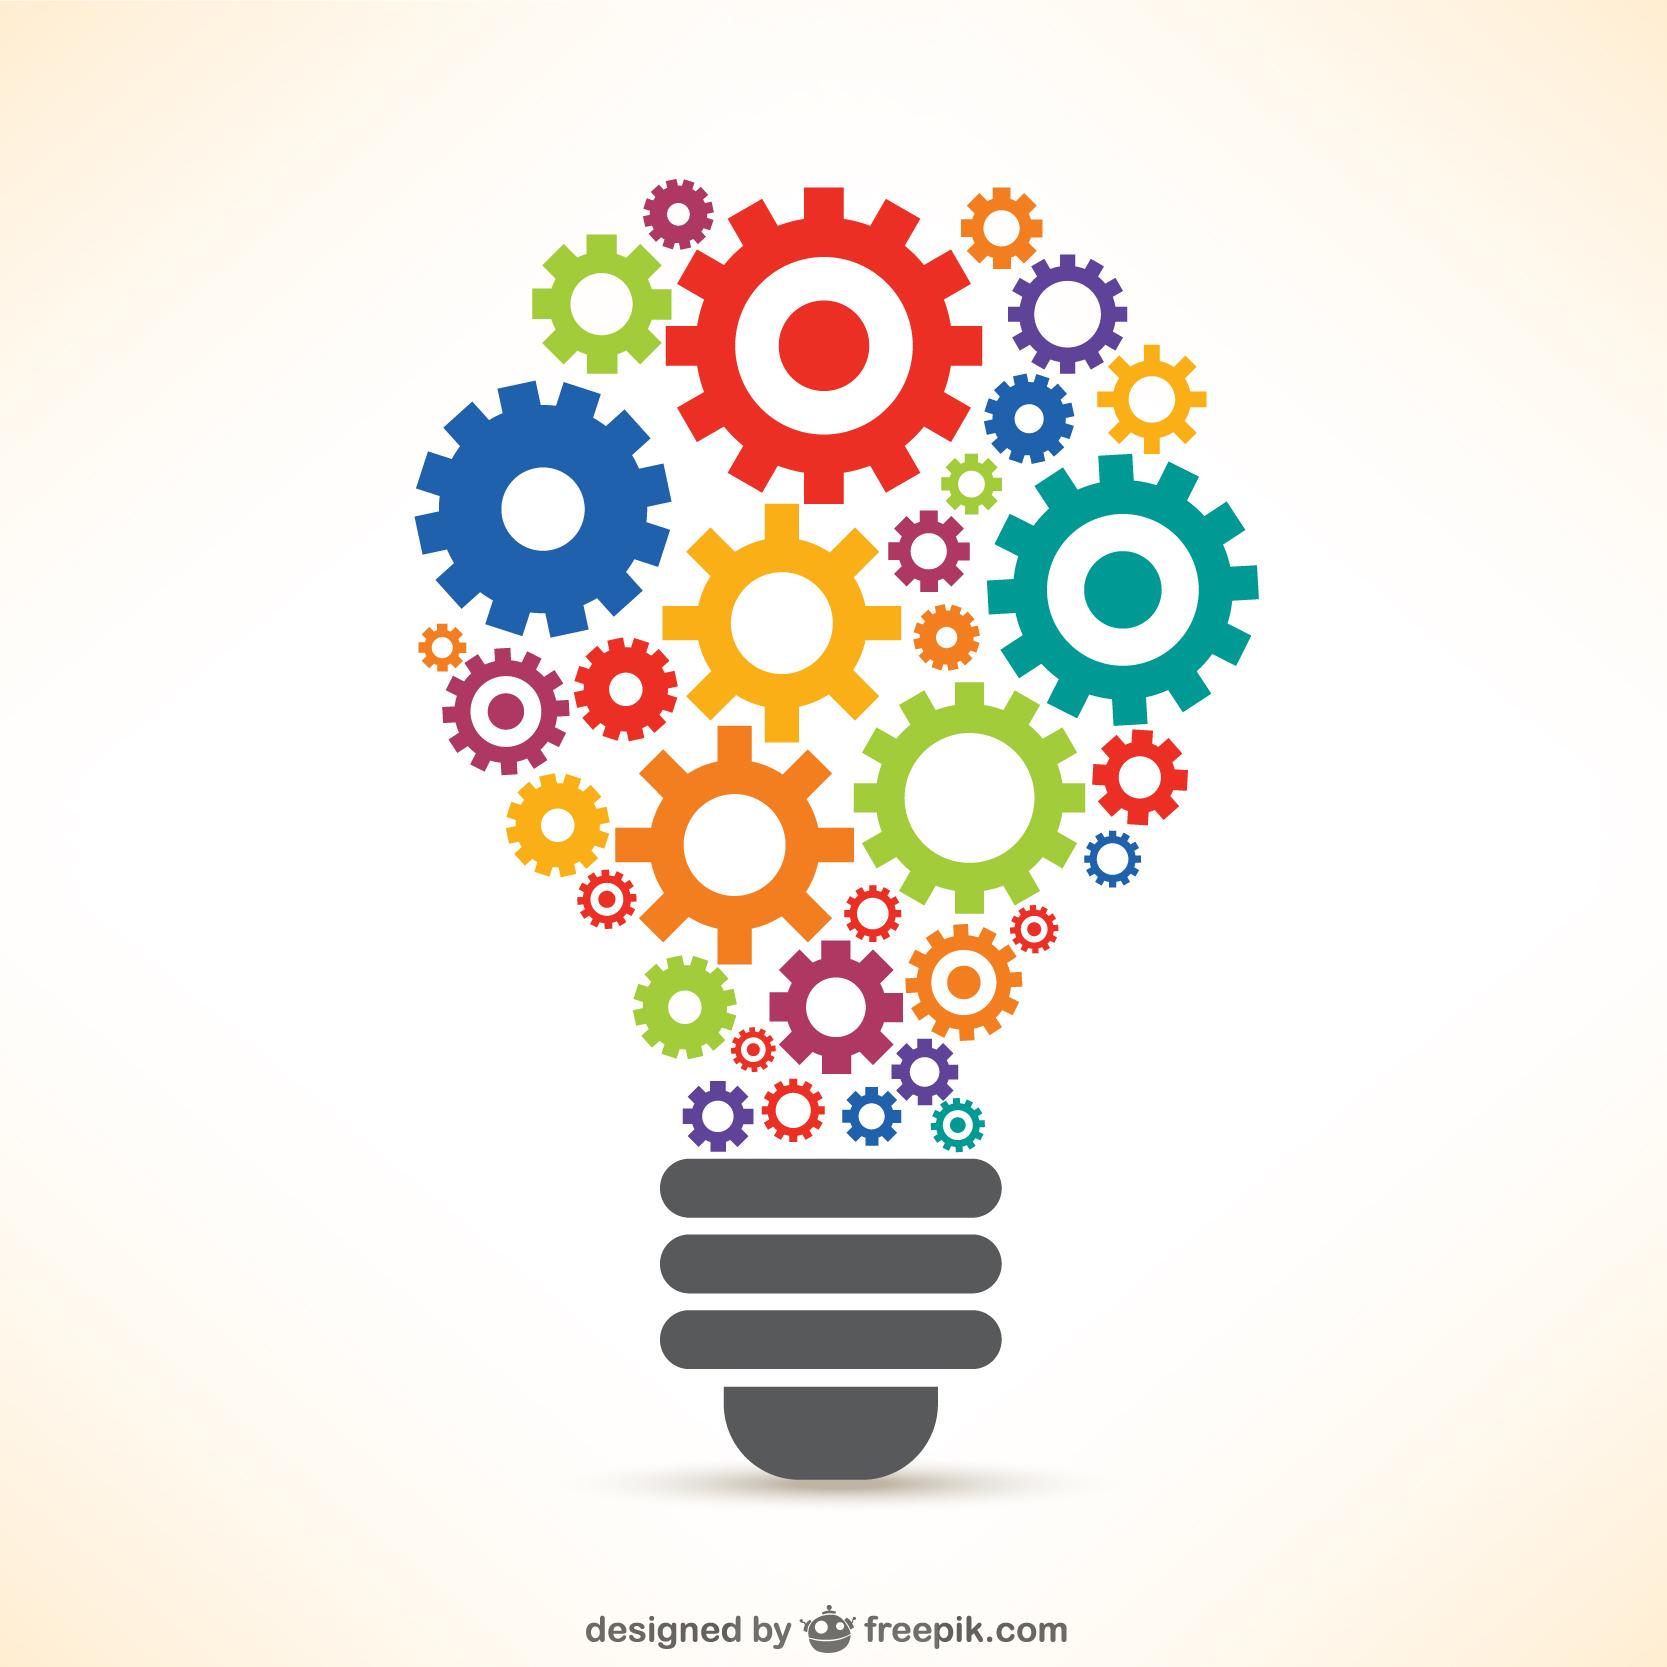 stratégie de différenciation idée